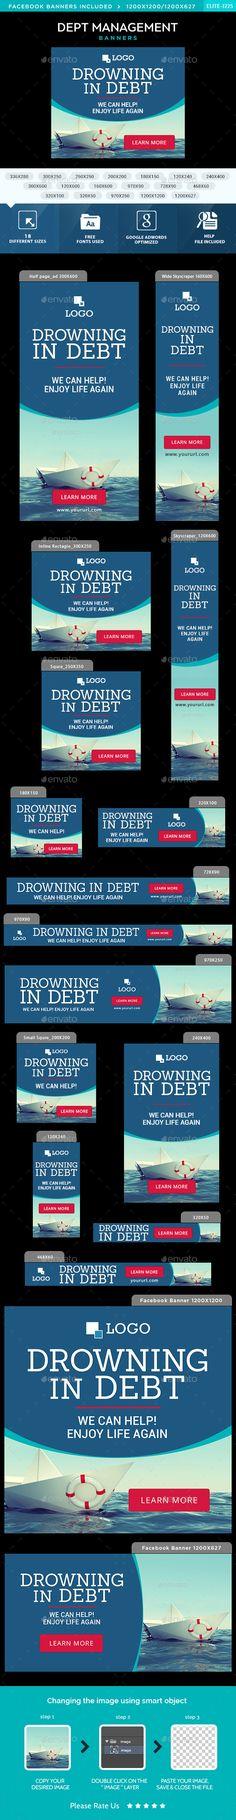 Debt Management Web Banners Template PSD. Download here: http://graphicriver.net/item/debt-management-banners/15021987?ref=ksioks